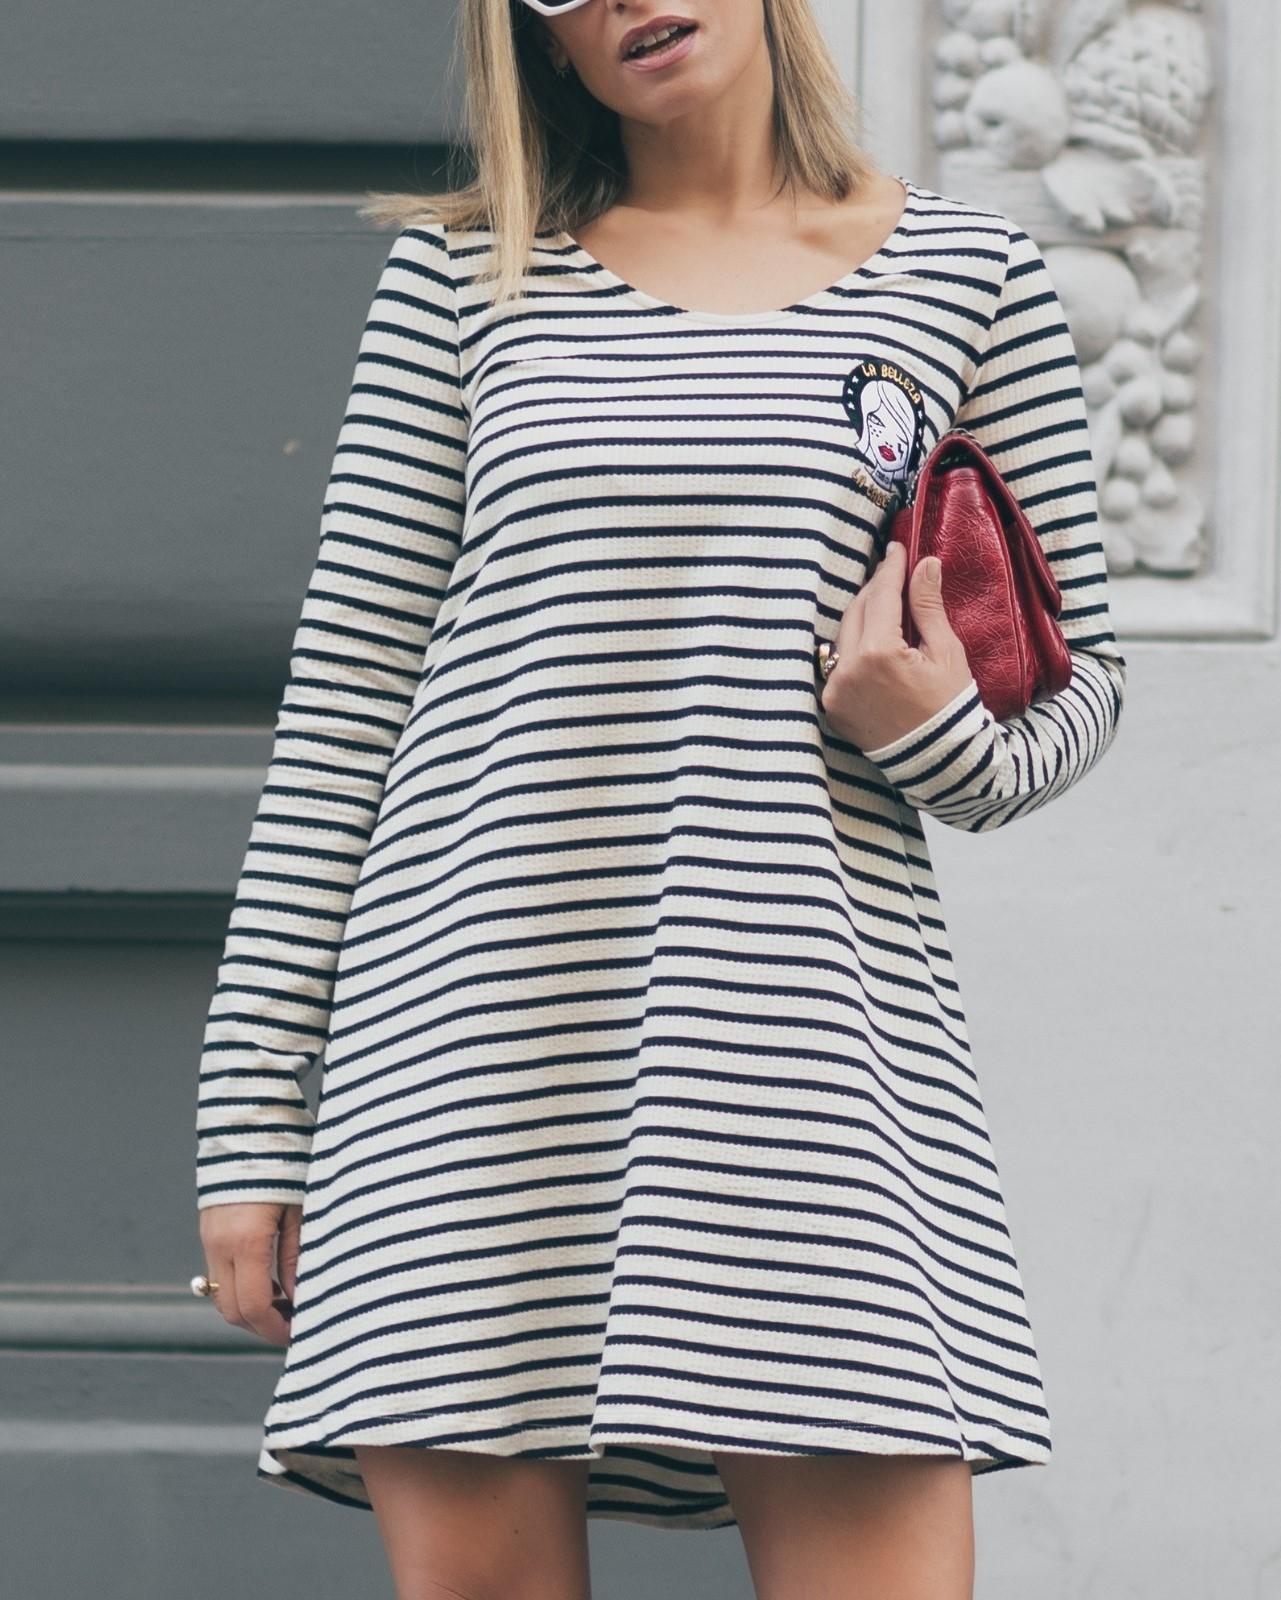 Vestido raya azul marino tejido rib 92% algodón 8% elastano corte evasé